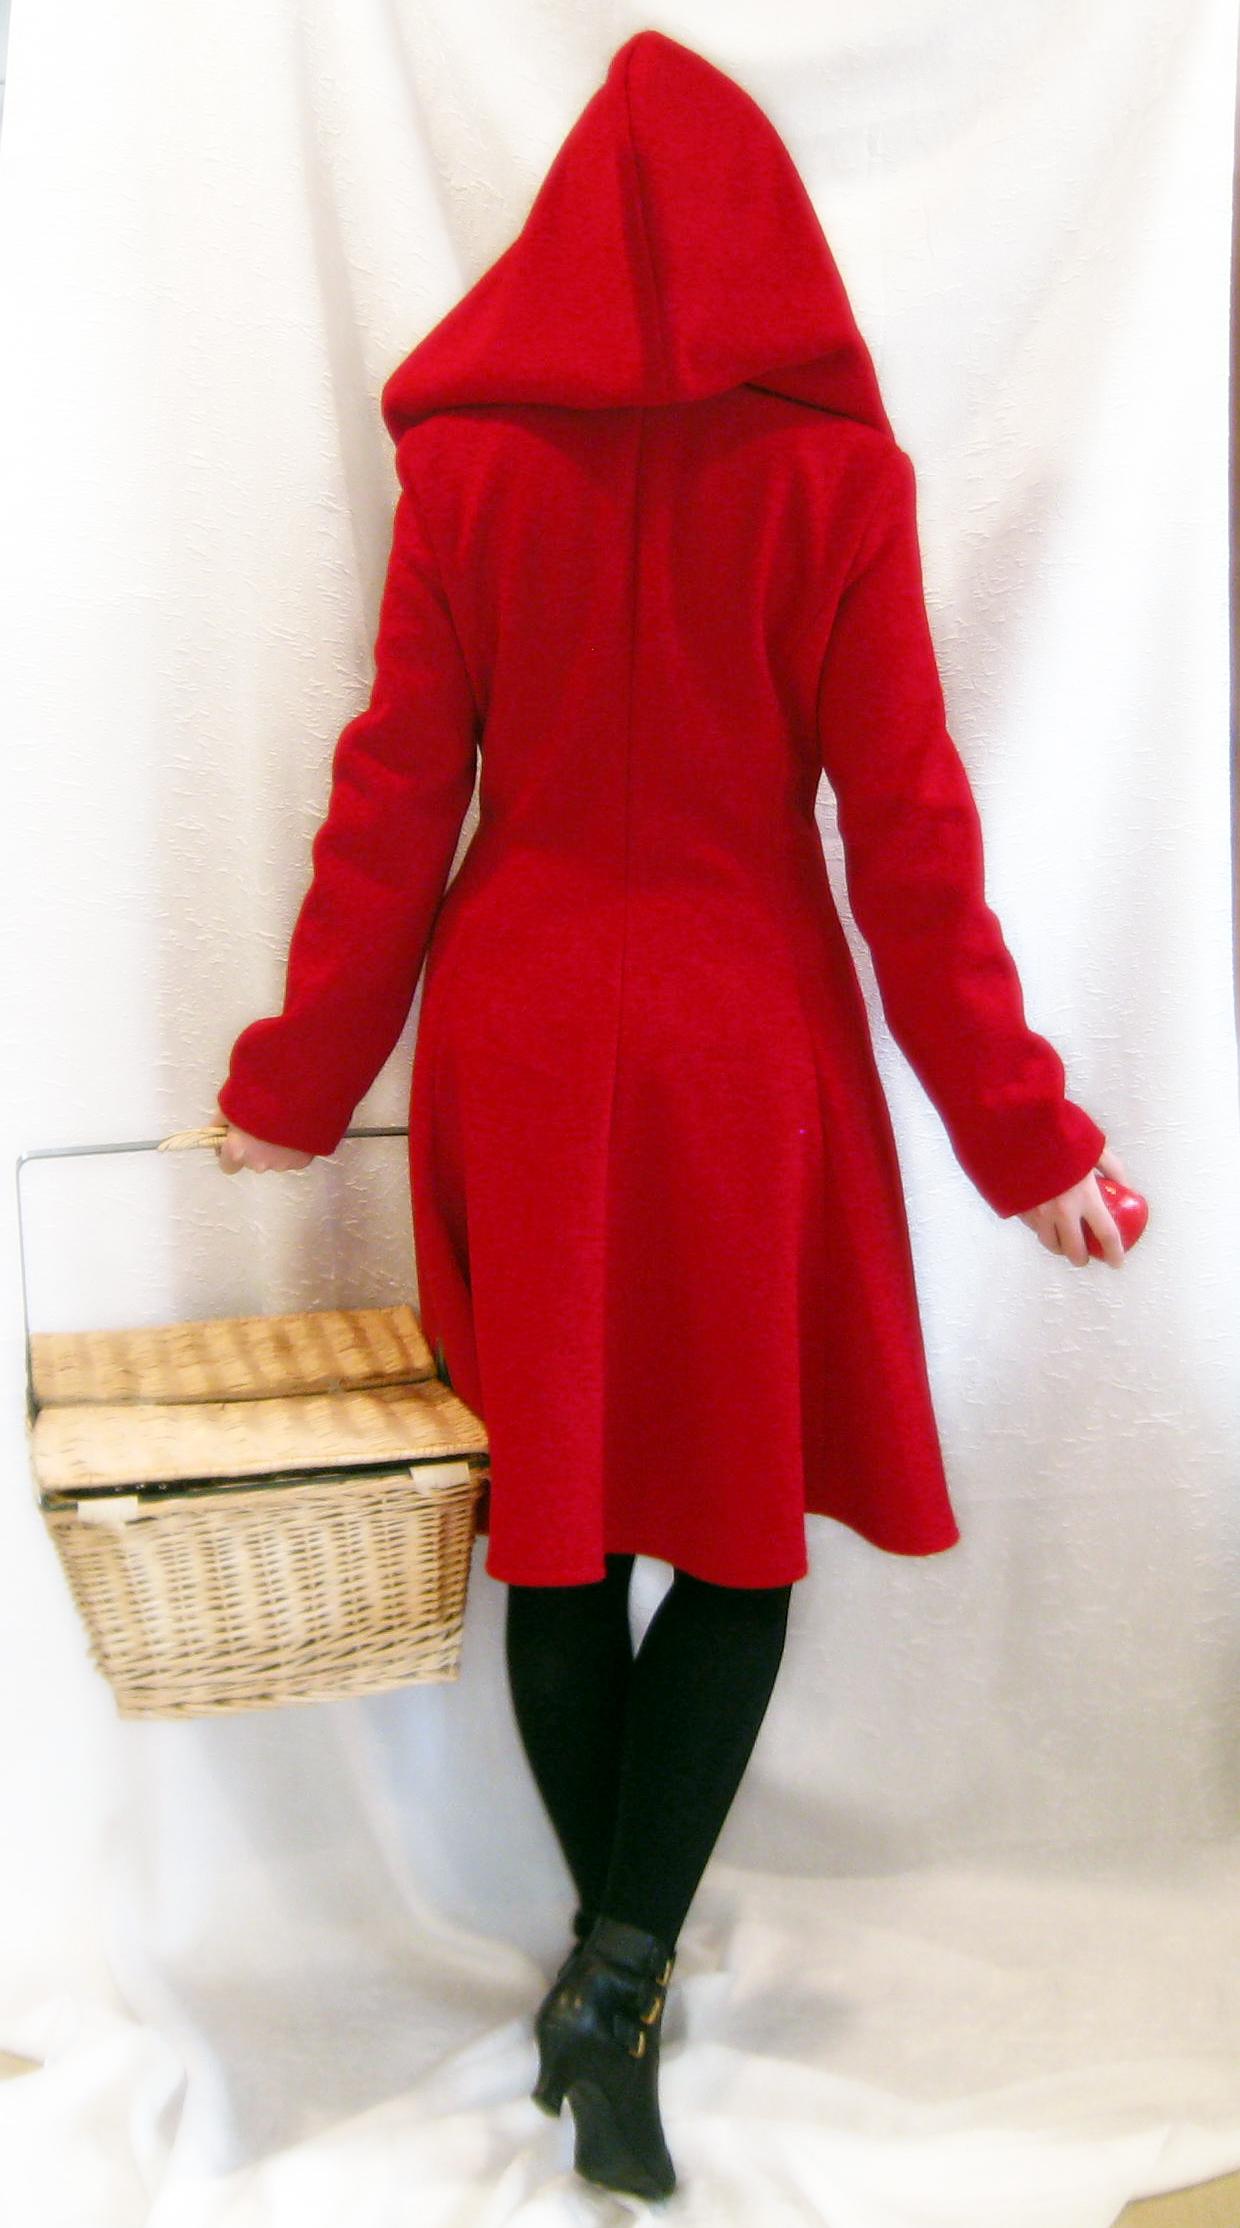 Red riding hood coat back by threeringcinema on deviantart